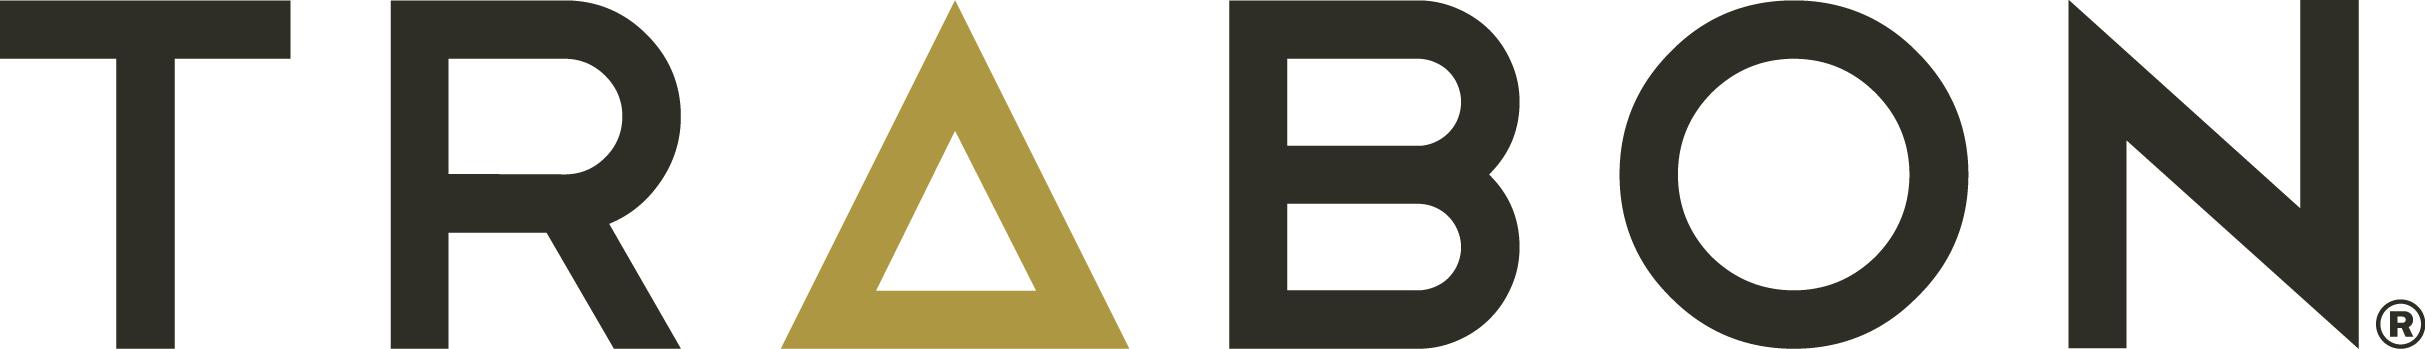 Logo_TwoTone.jpg